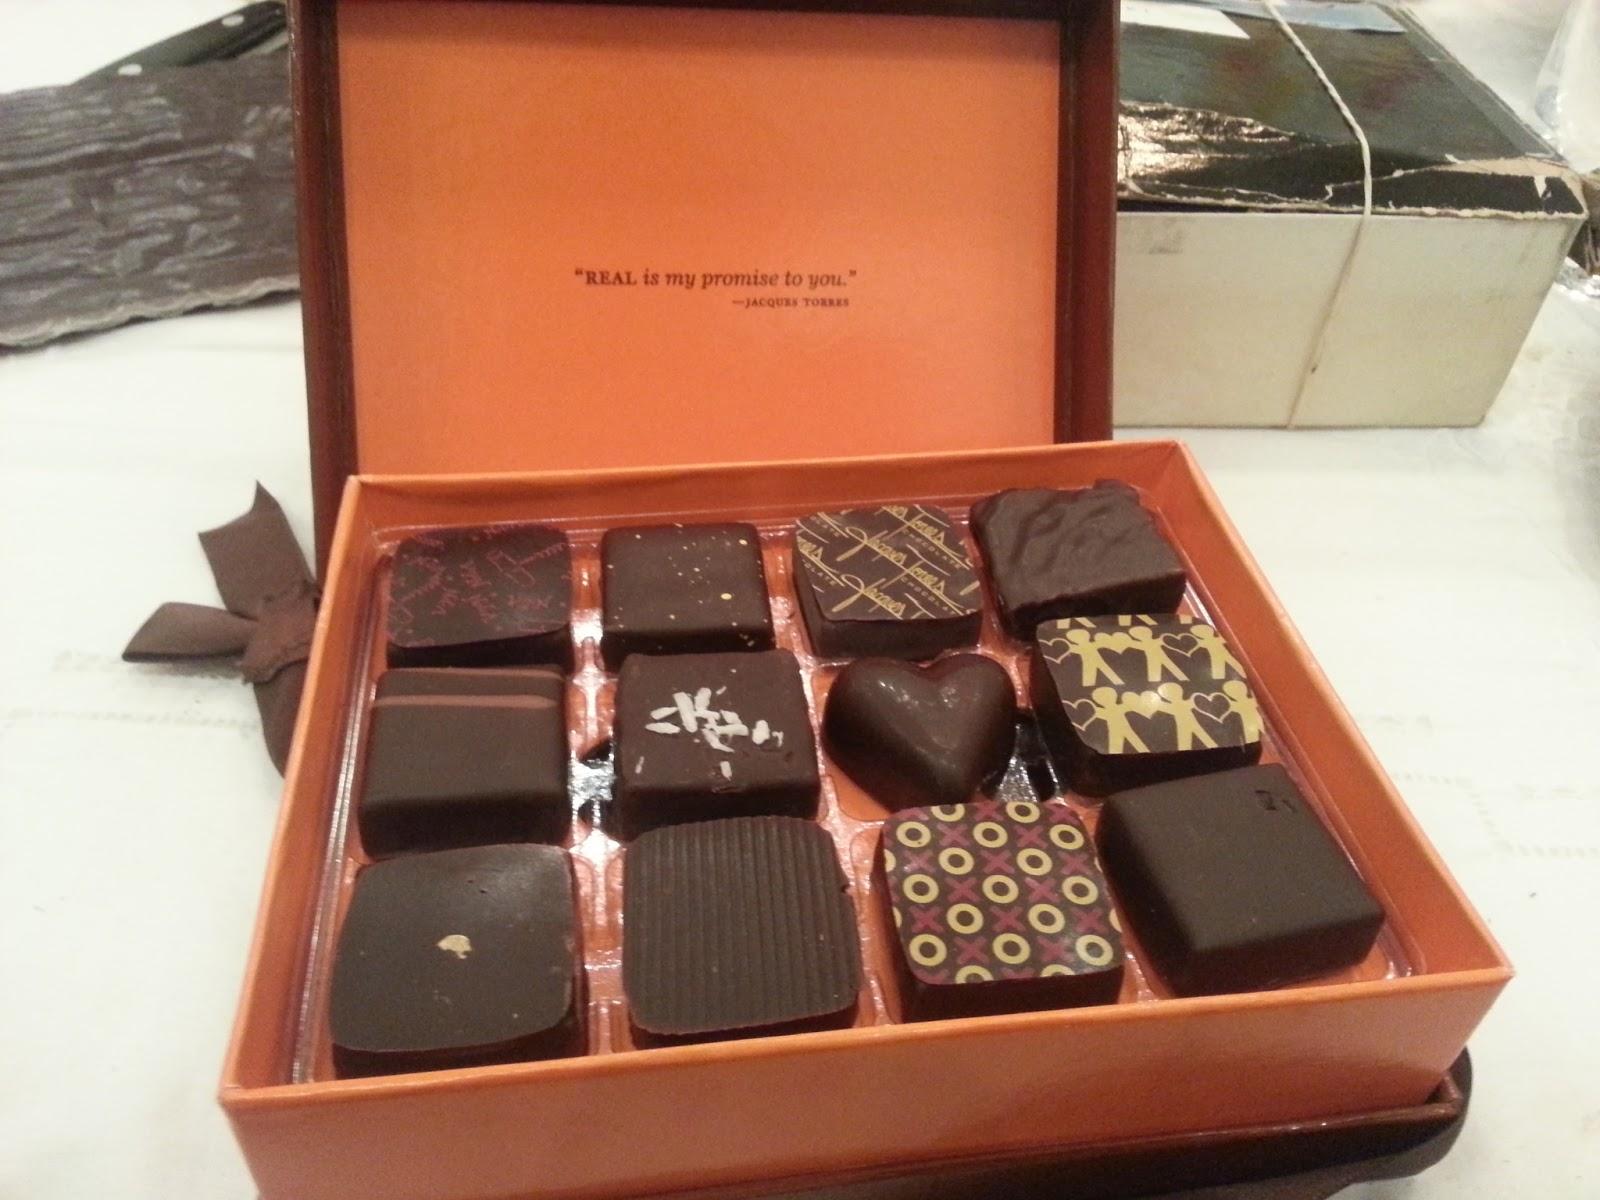 Chocolate NYC: BLU Boy and Jacques Torres Bon Bons